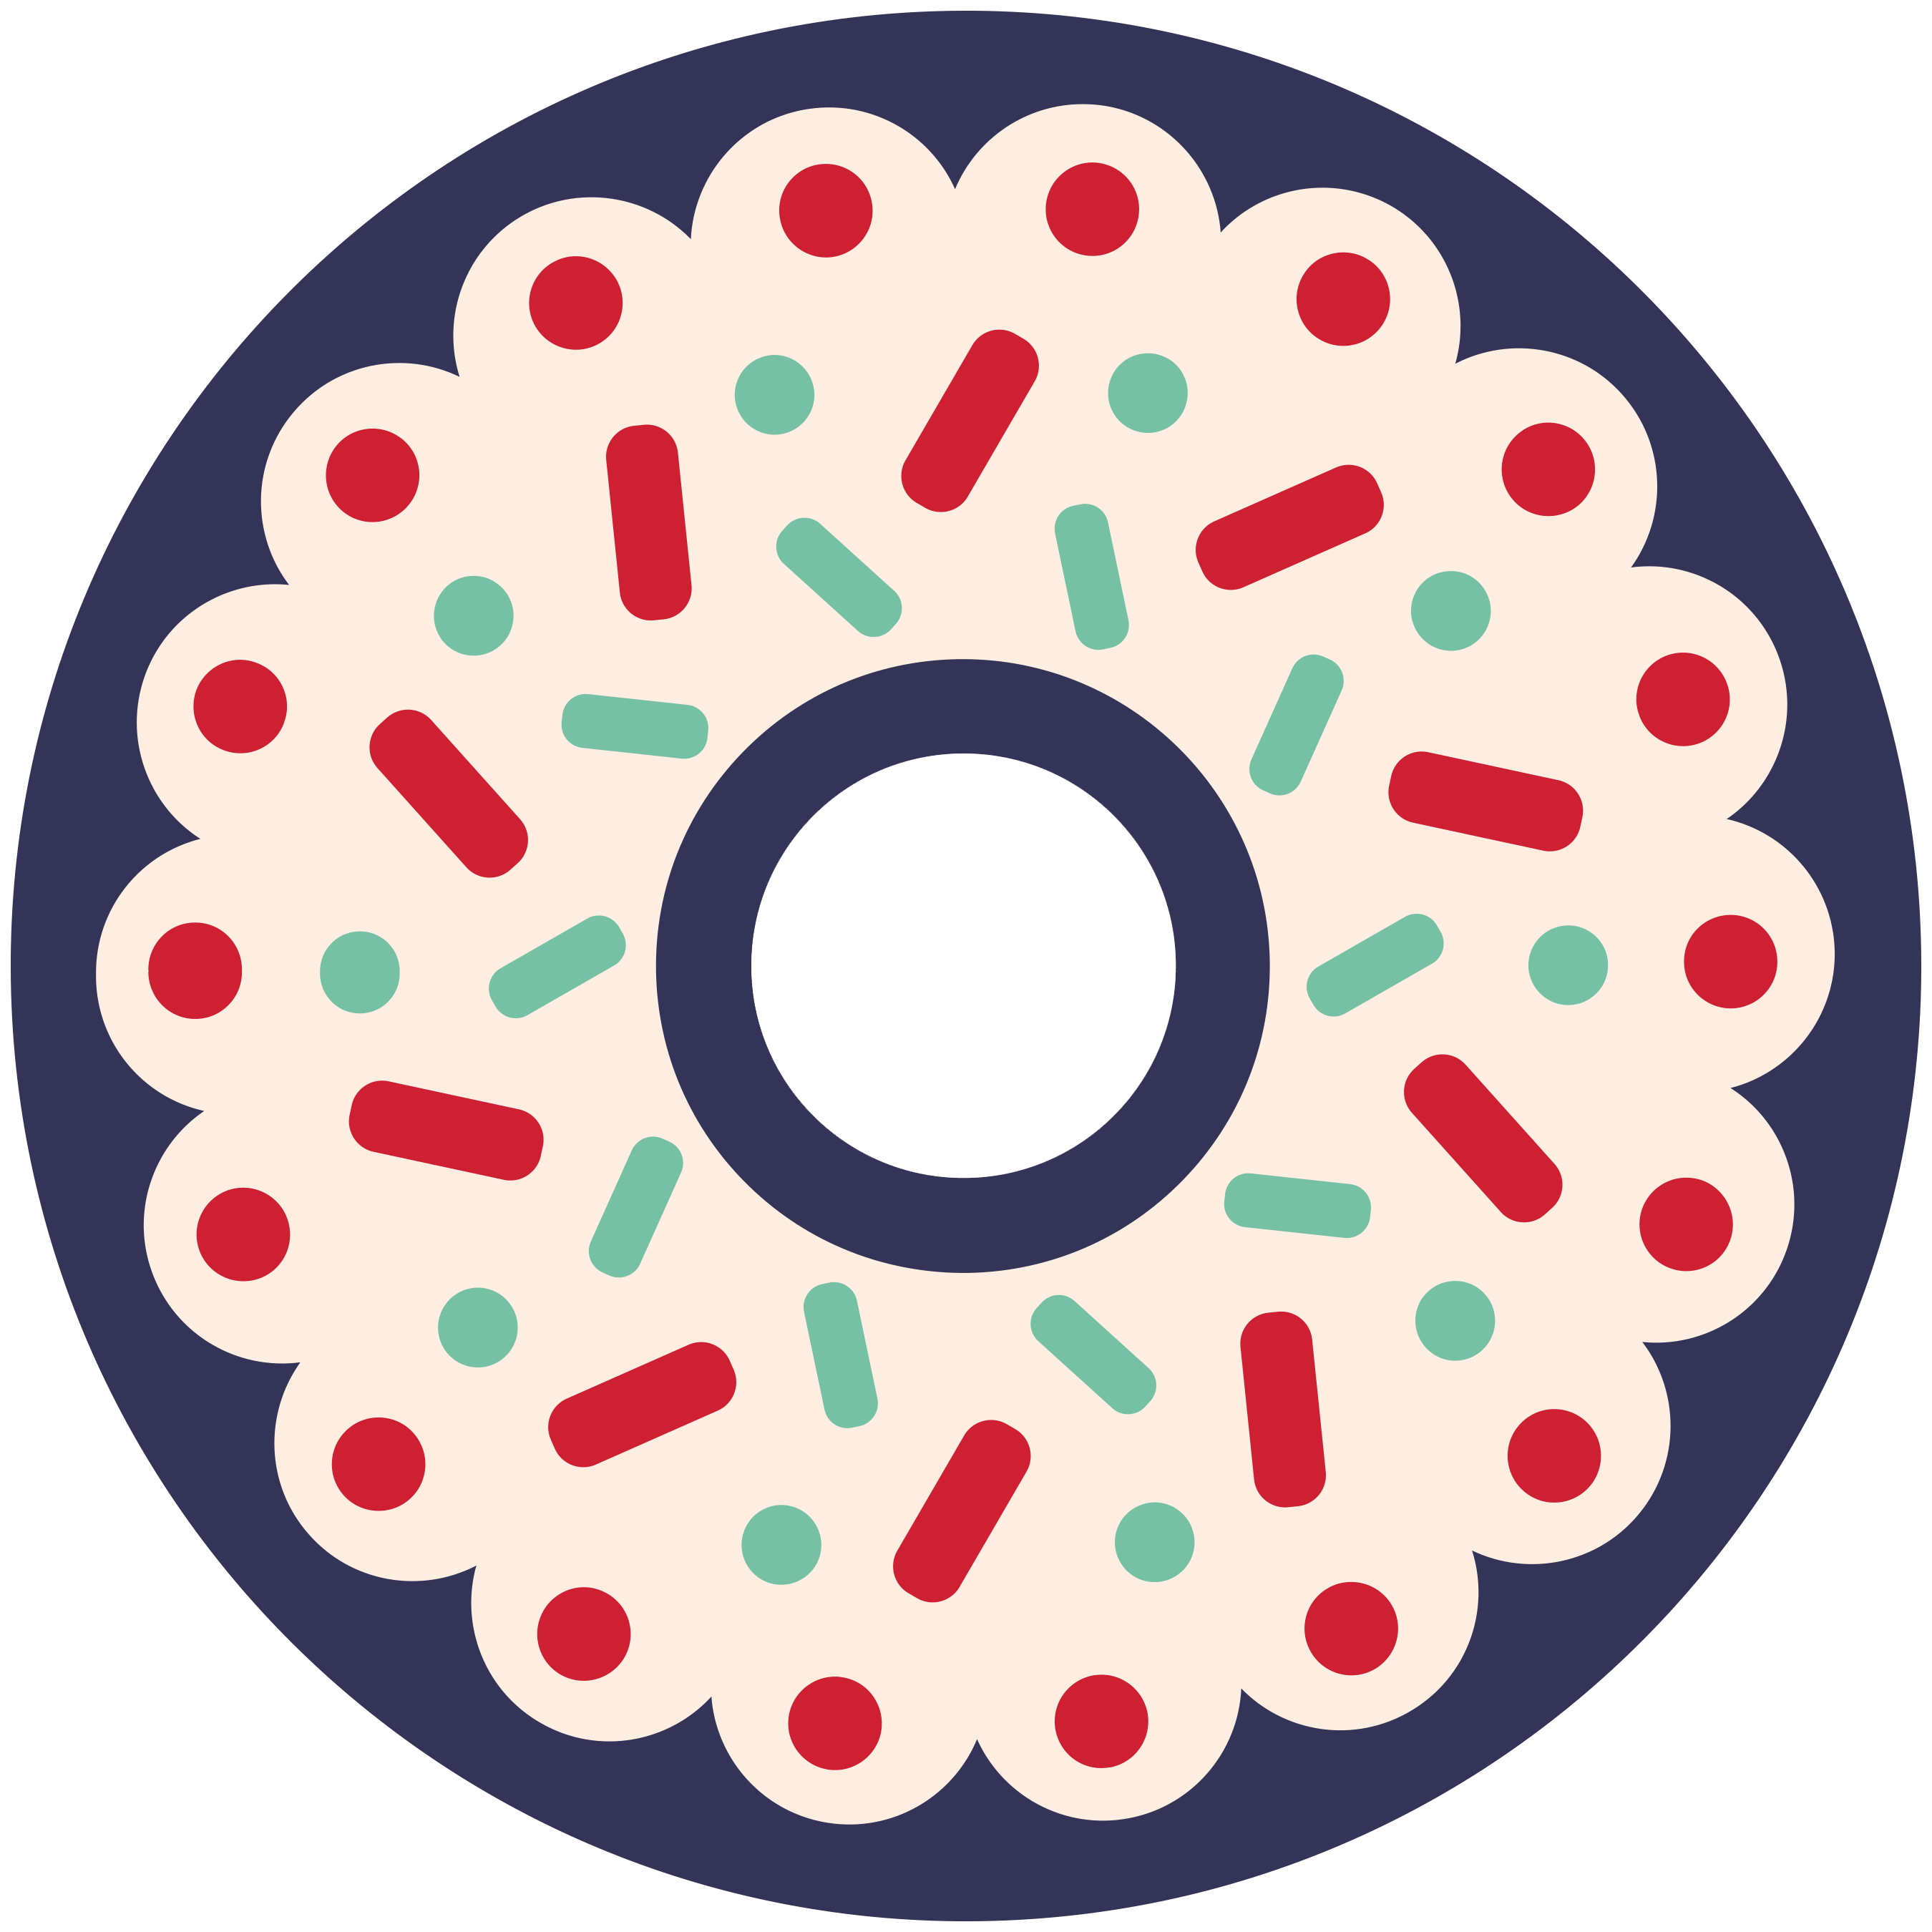 Donuts clipart pink. Suzyjodonuts phoebe mikalonis suzyjo